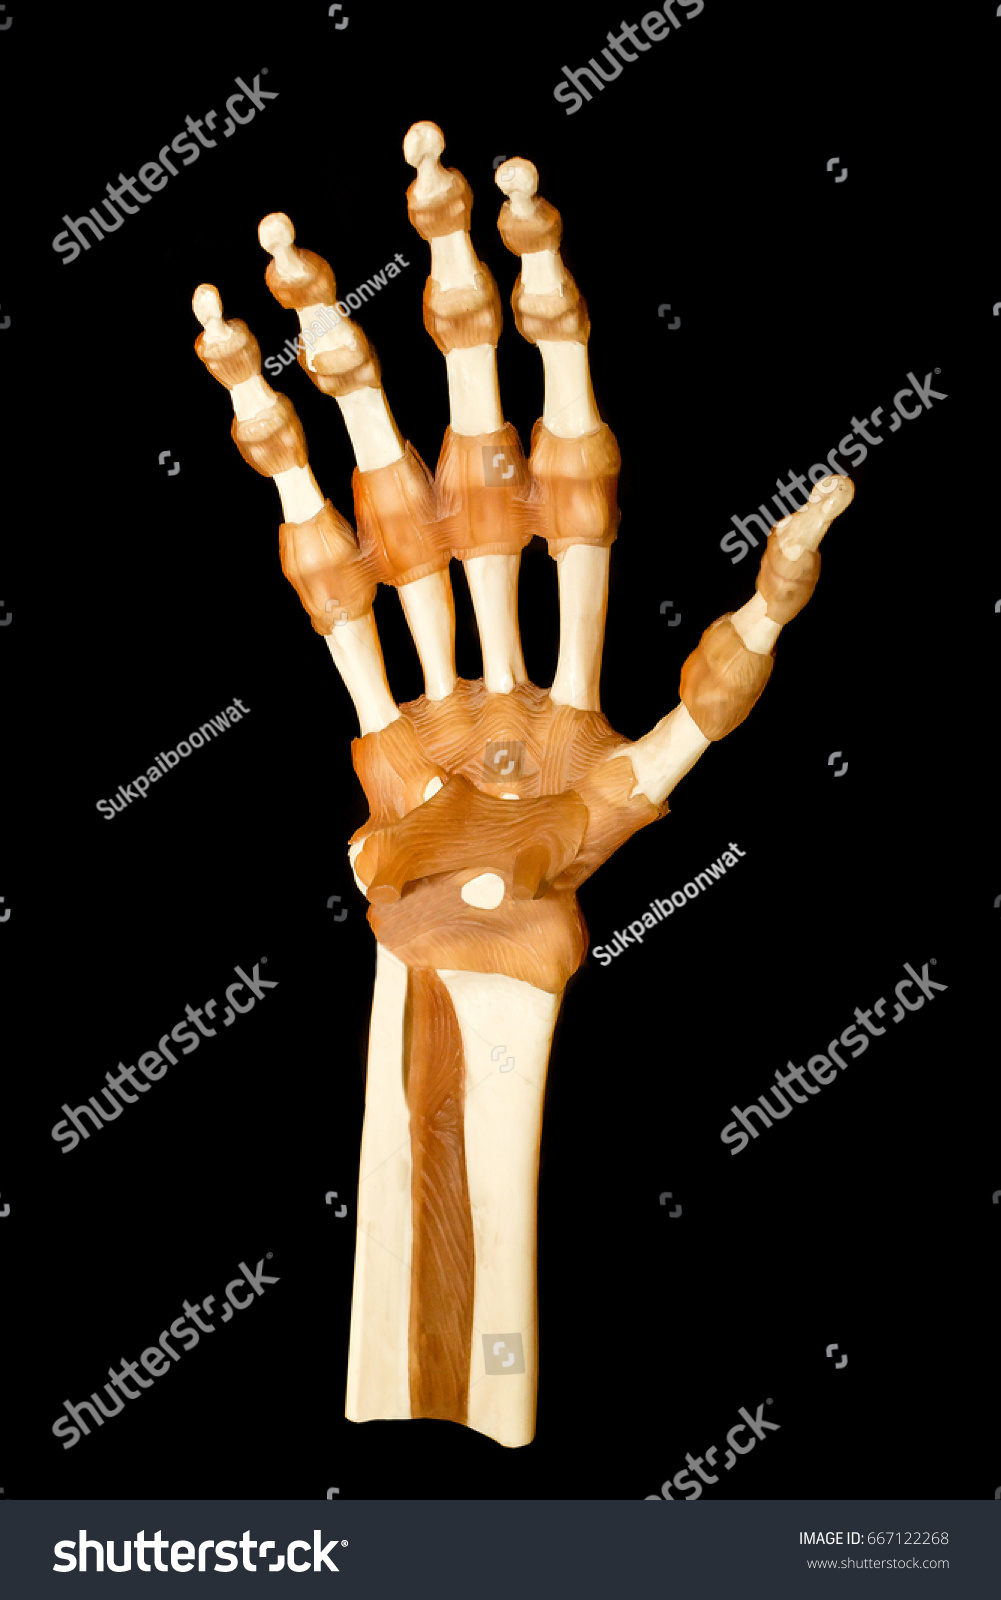 Hand Tendon Bone Human Hand Anatomy Stock Photo (Edit Now) 667122268 ...